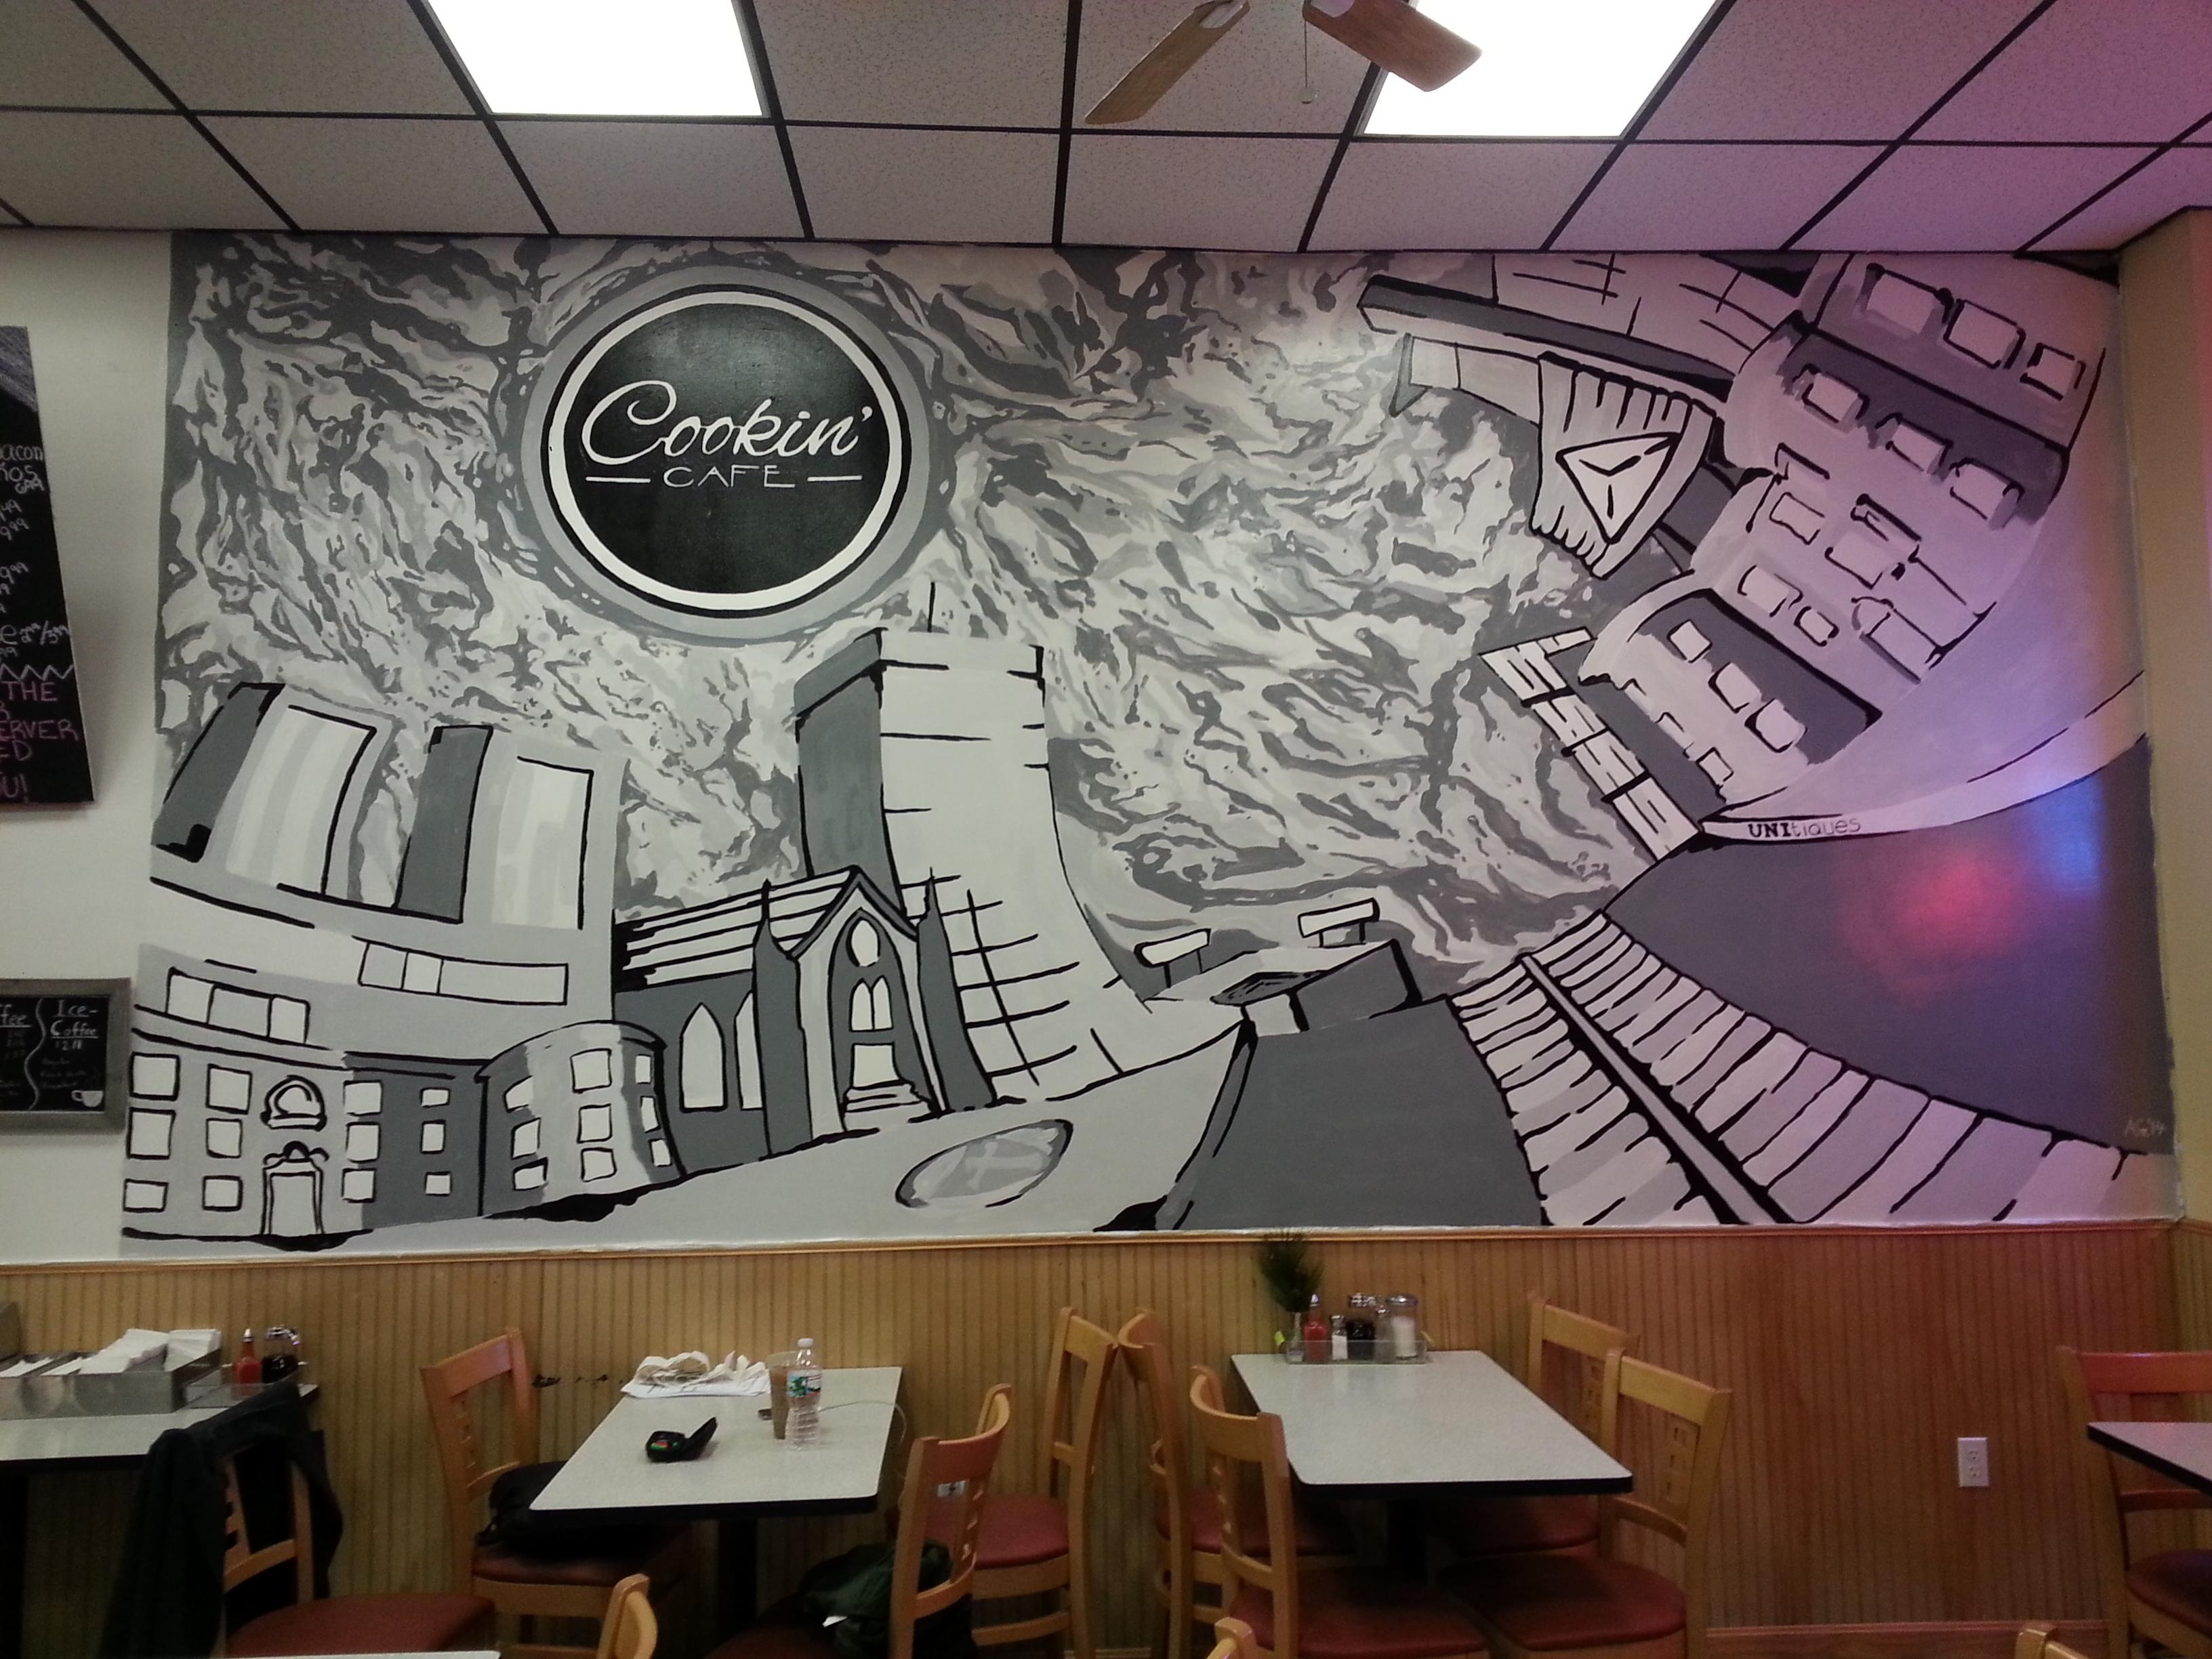 Cookin'Cafe Mural